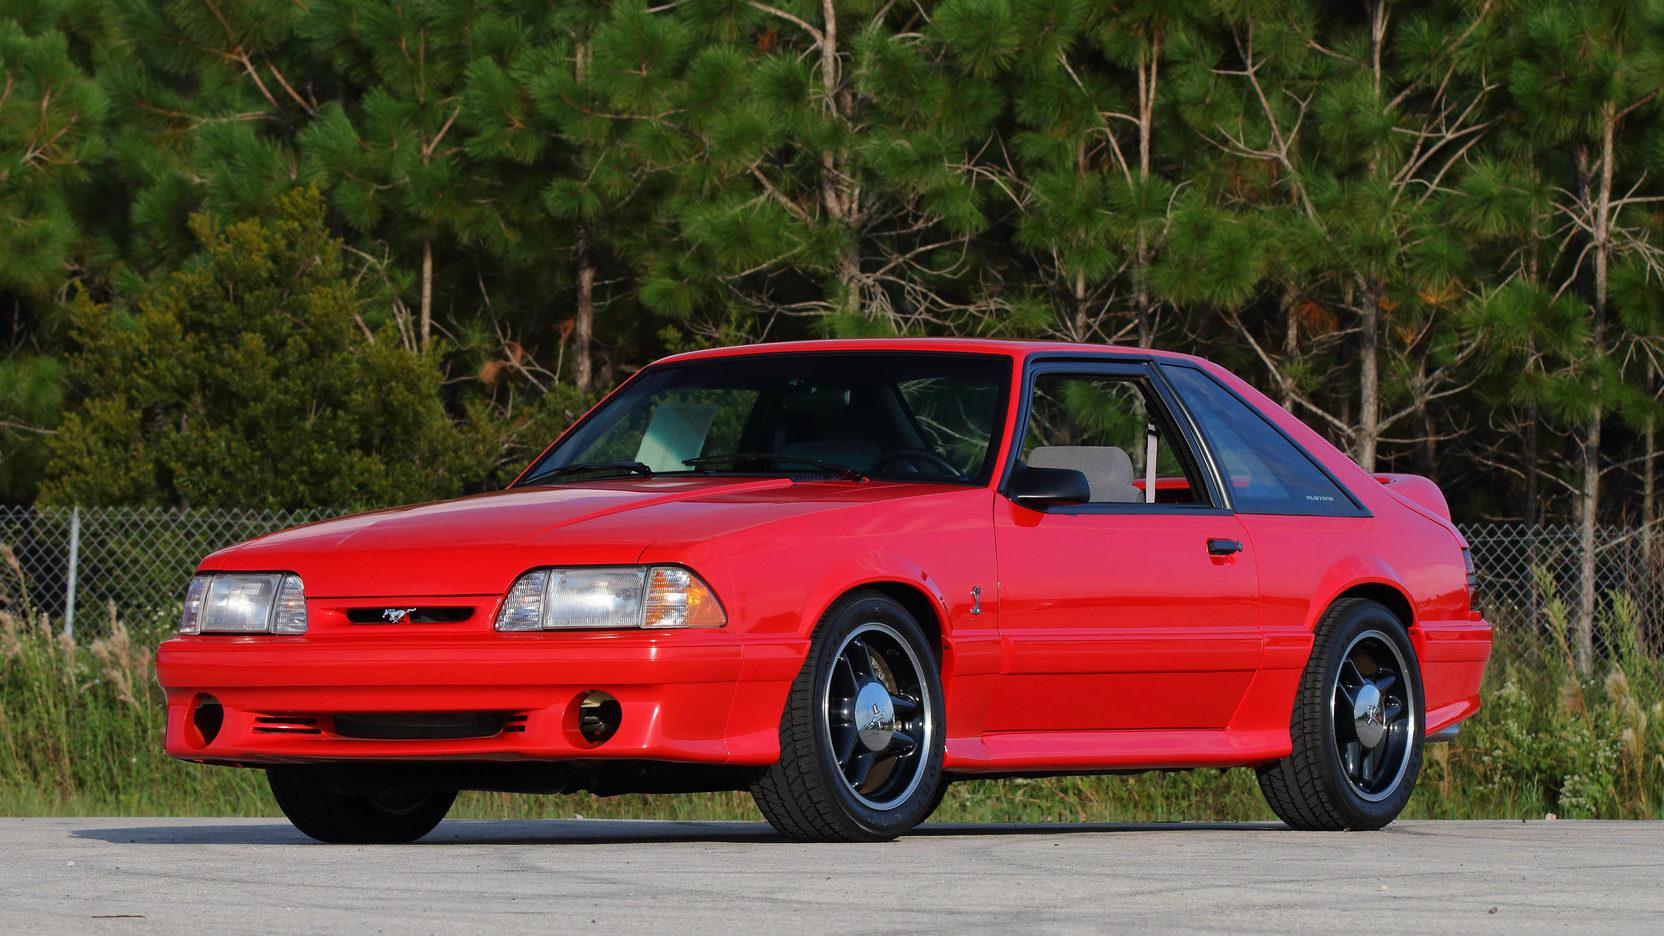 1993 Ford Mustang SVT Cobra R front 3/4